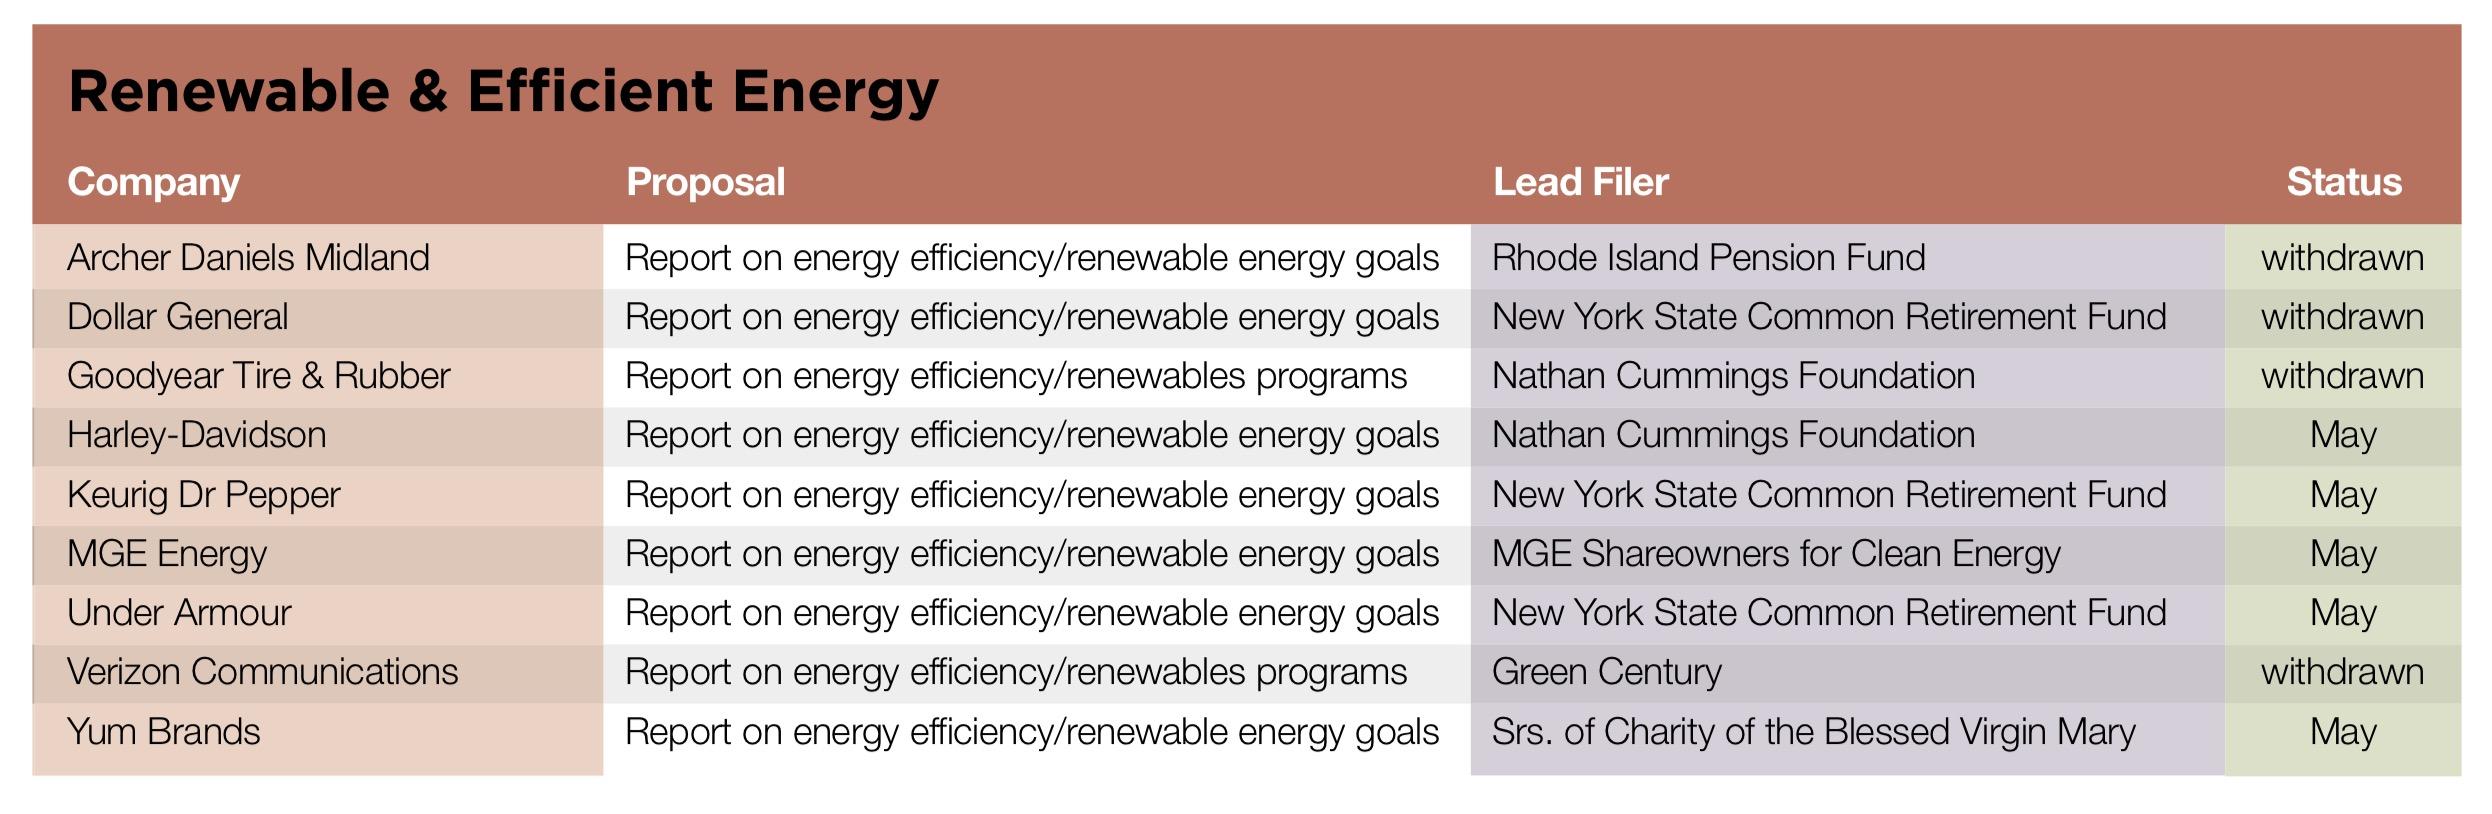 Renewable & Efficient Energy.jpg